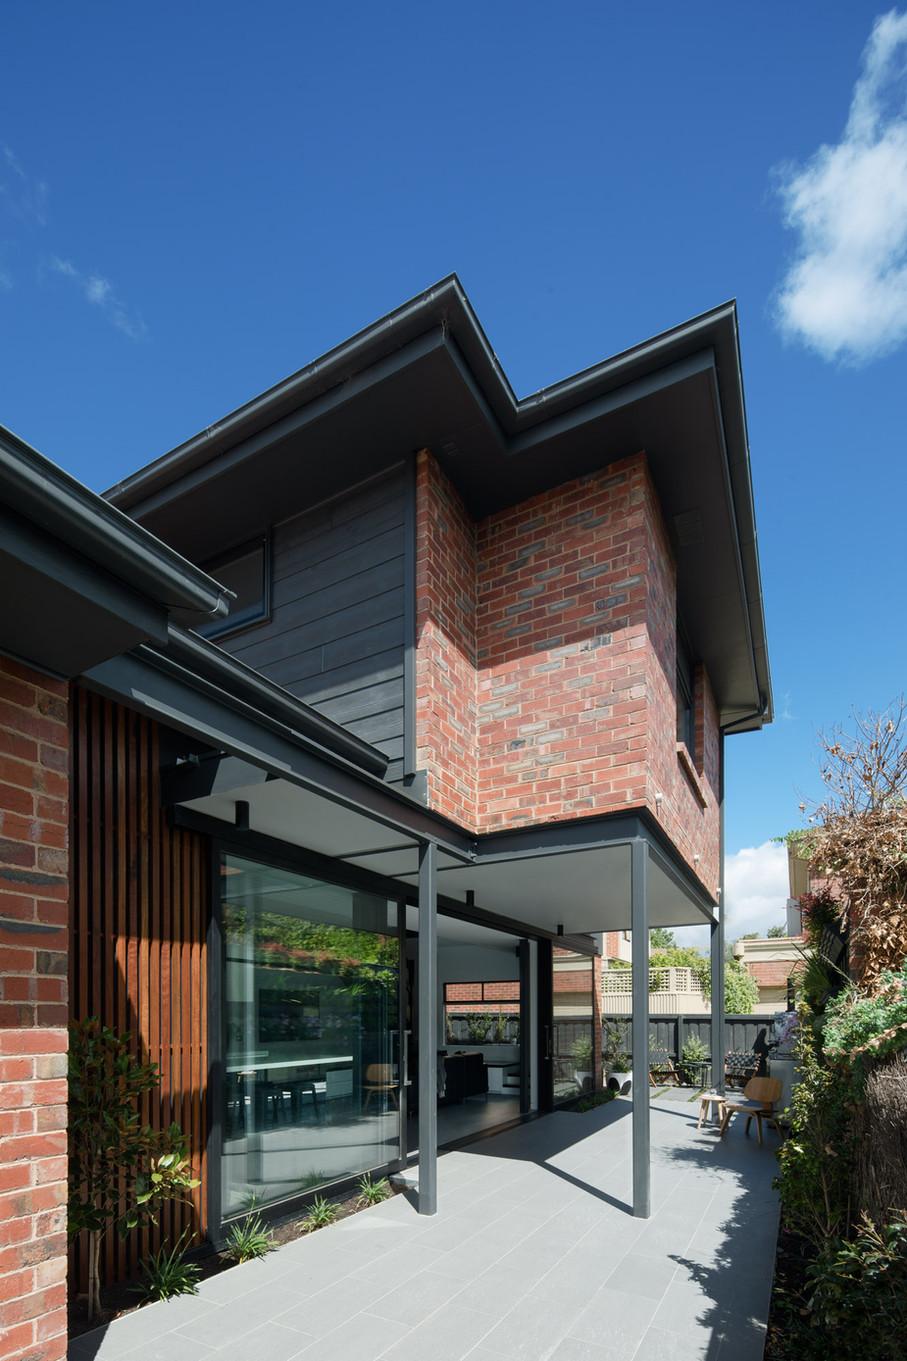 Rosstang_Architects_Darling_House_©Tatja